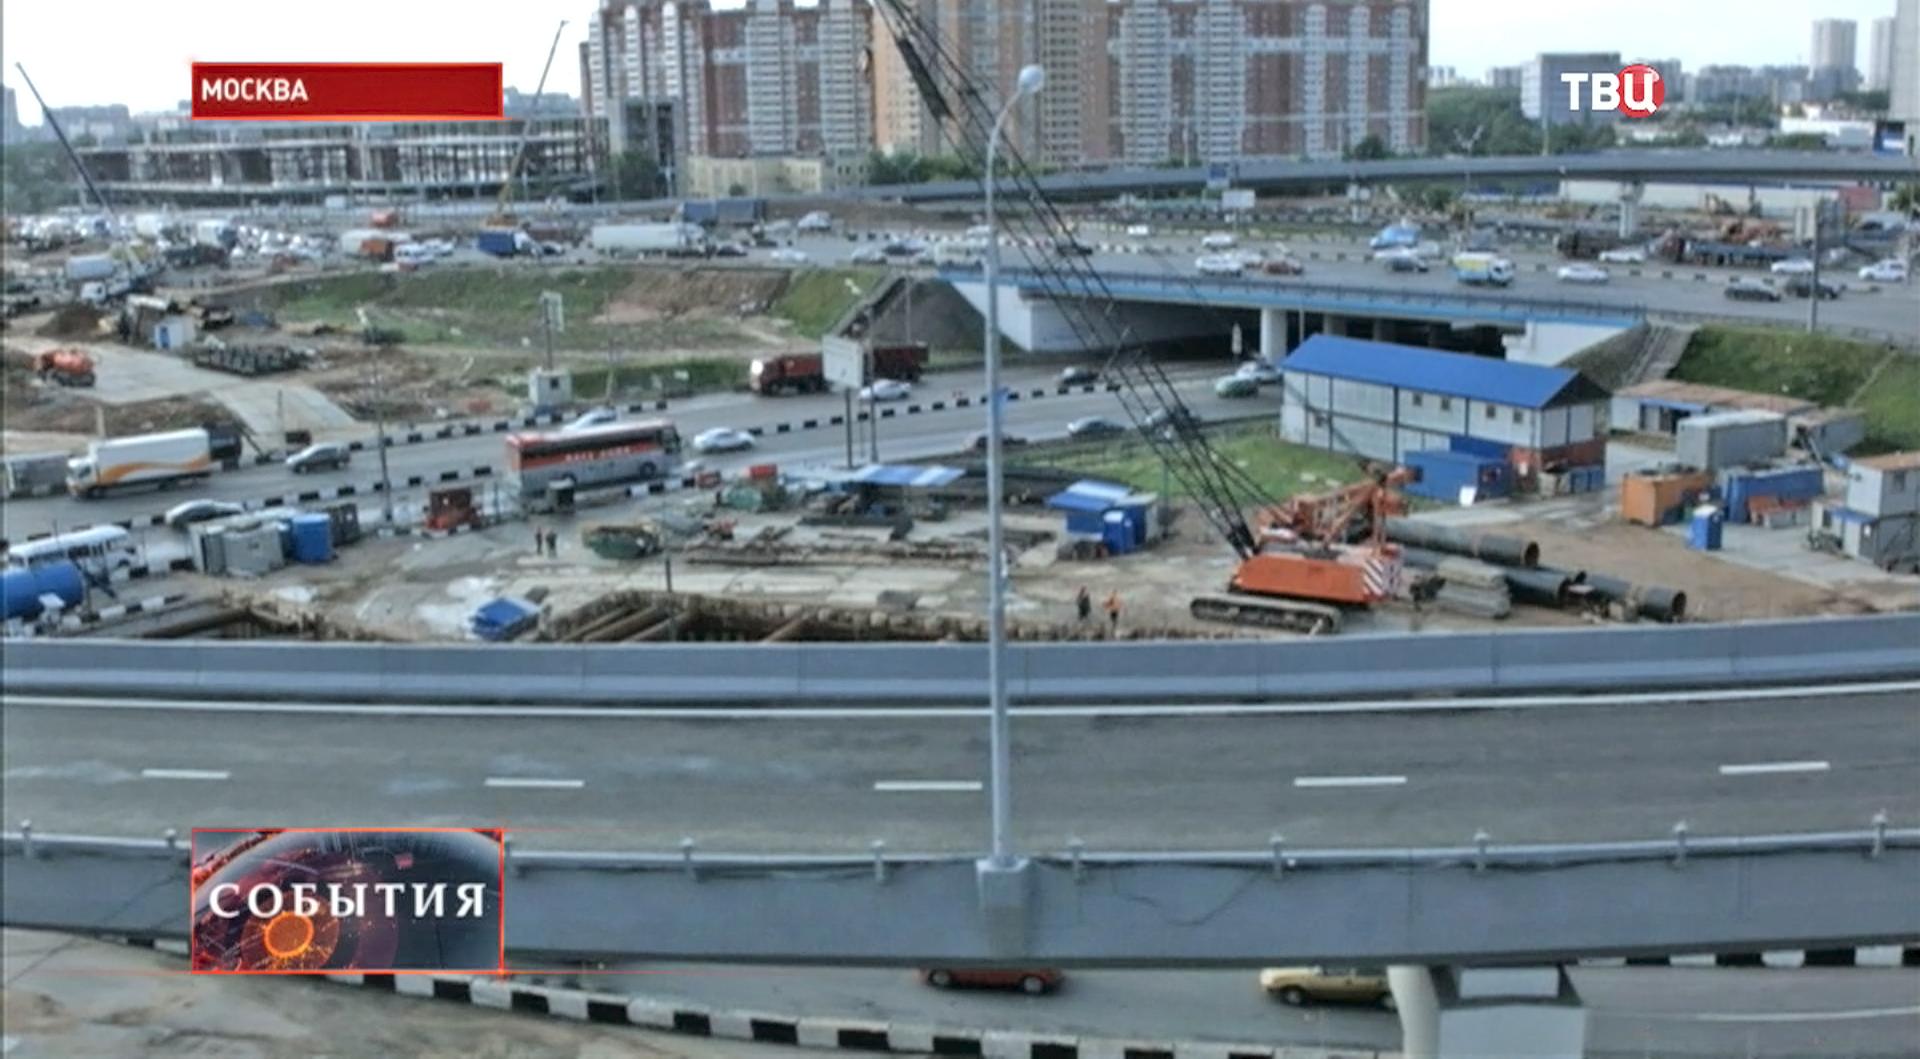 Развязка Дмитровского шоссе и МКАД